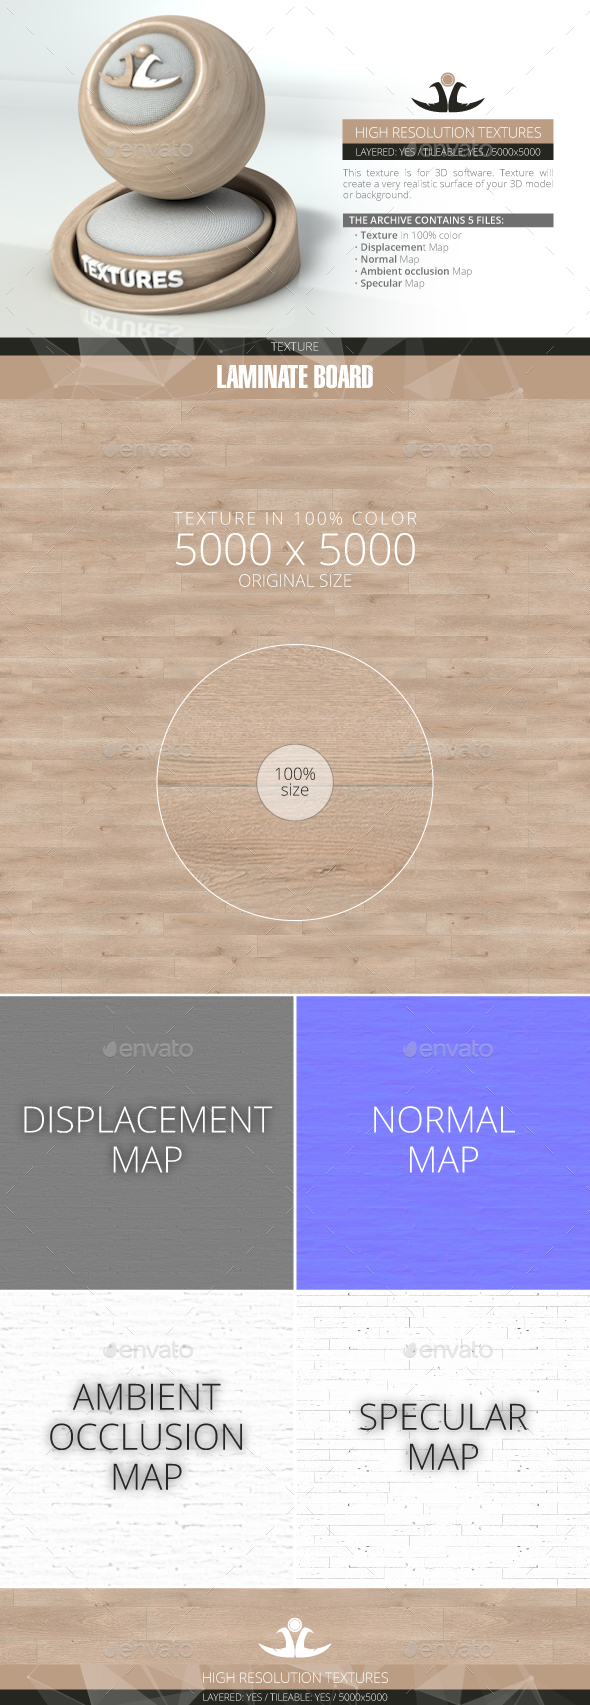 Laminate Board 16 - 3DOcean Item for Sale